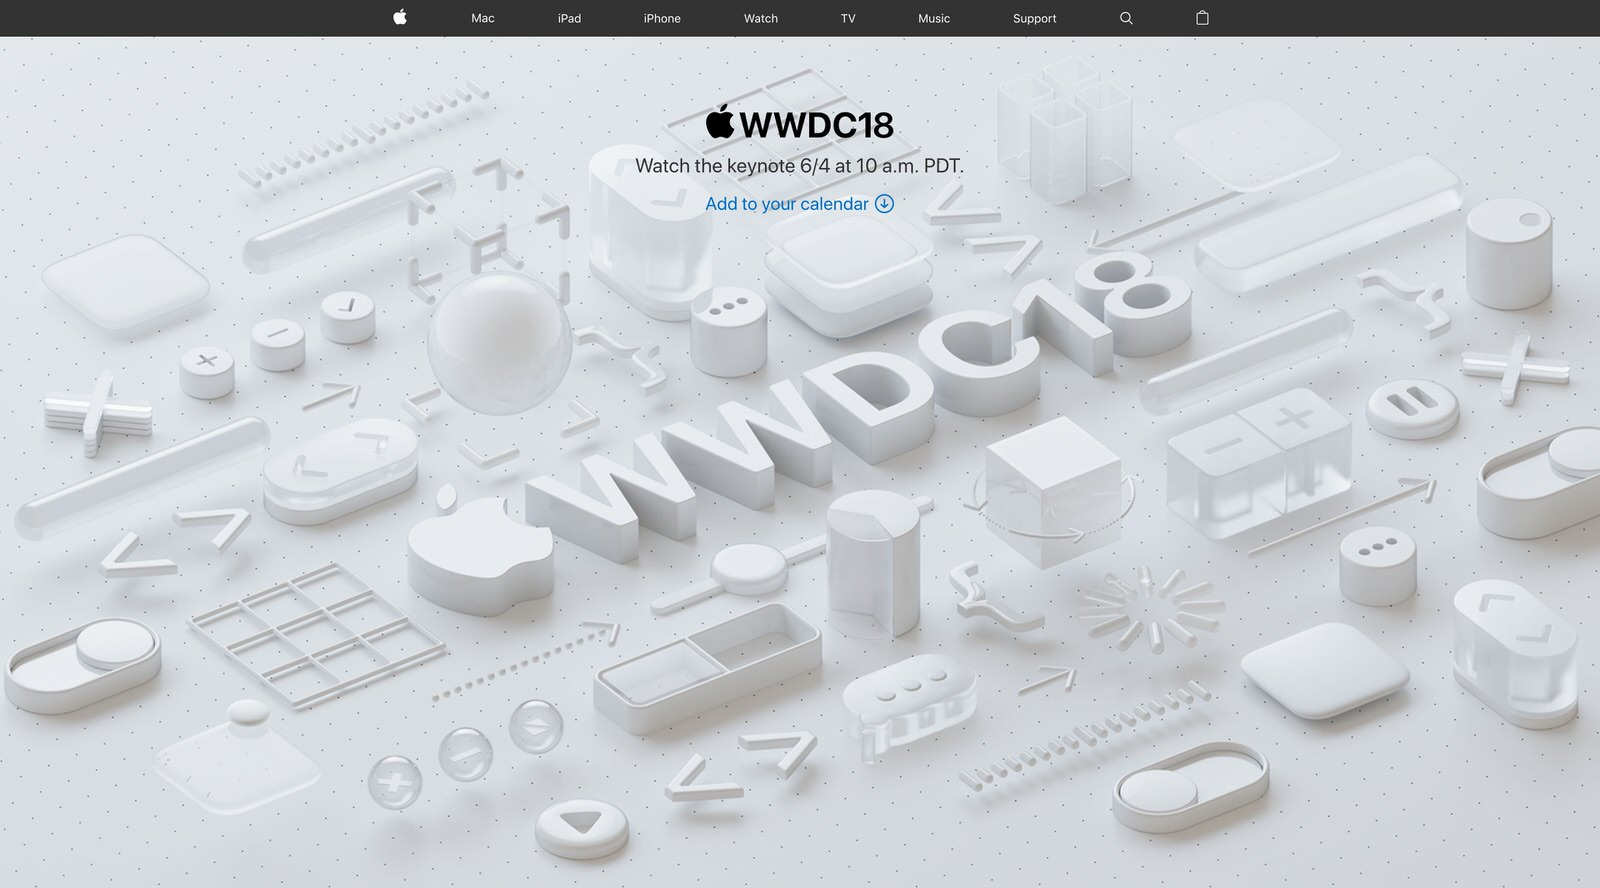 WWDC 2018では新製品の発表はない? 米Bloomberg報道